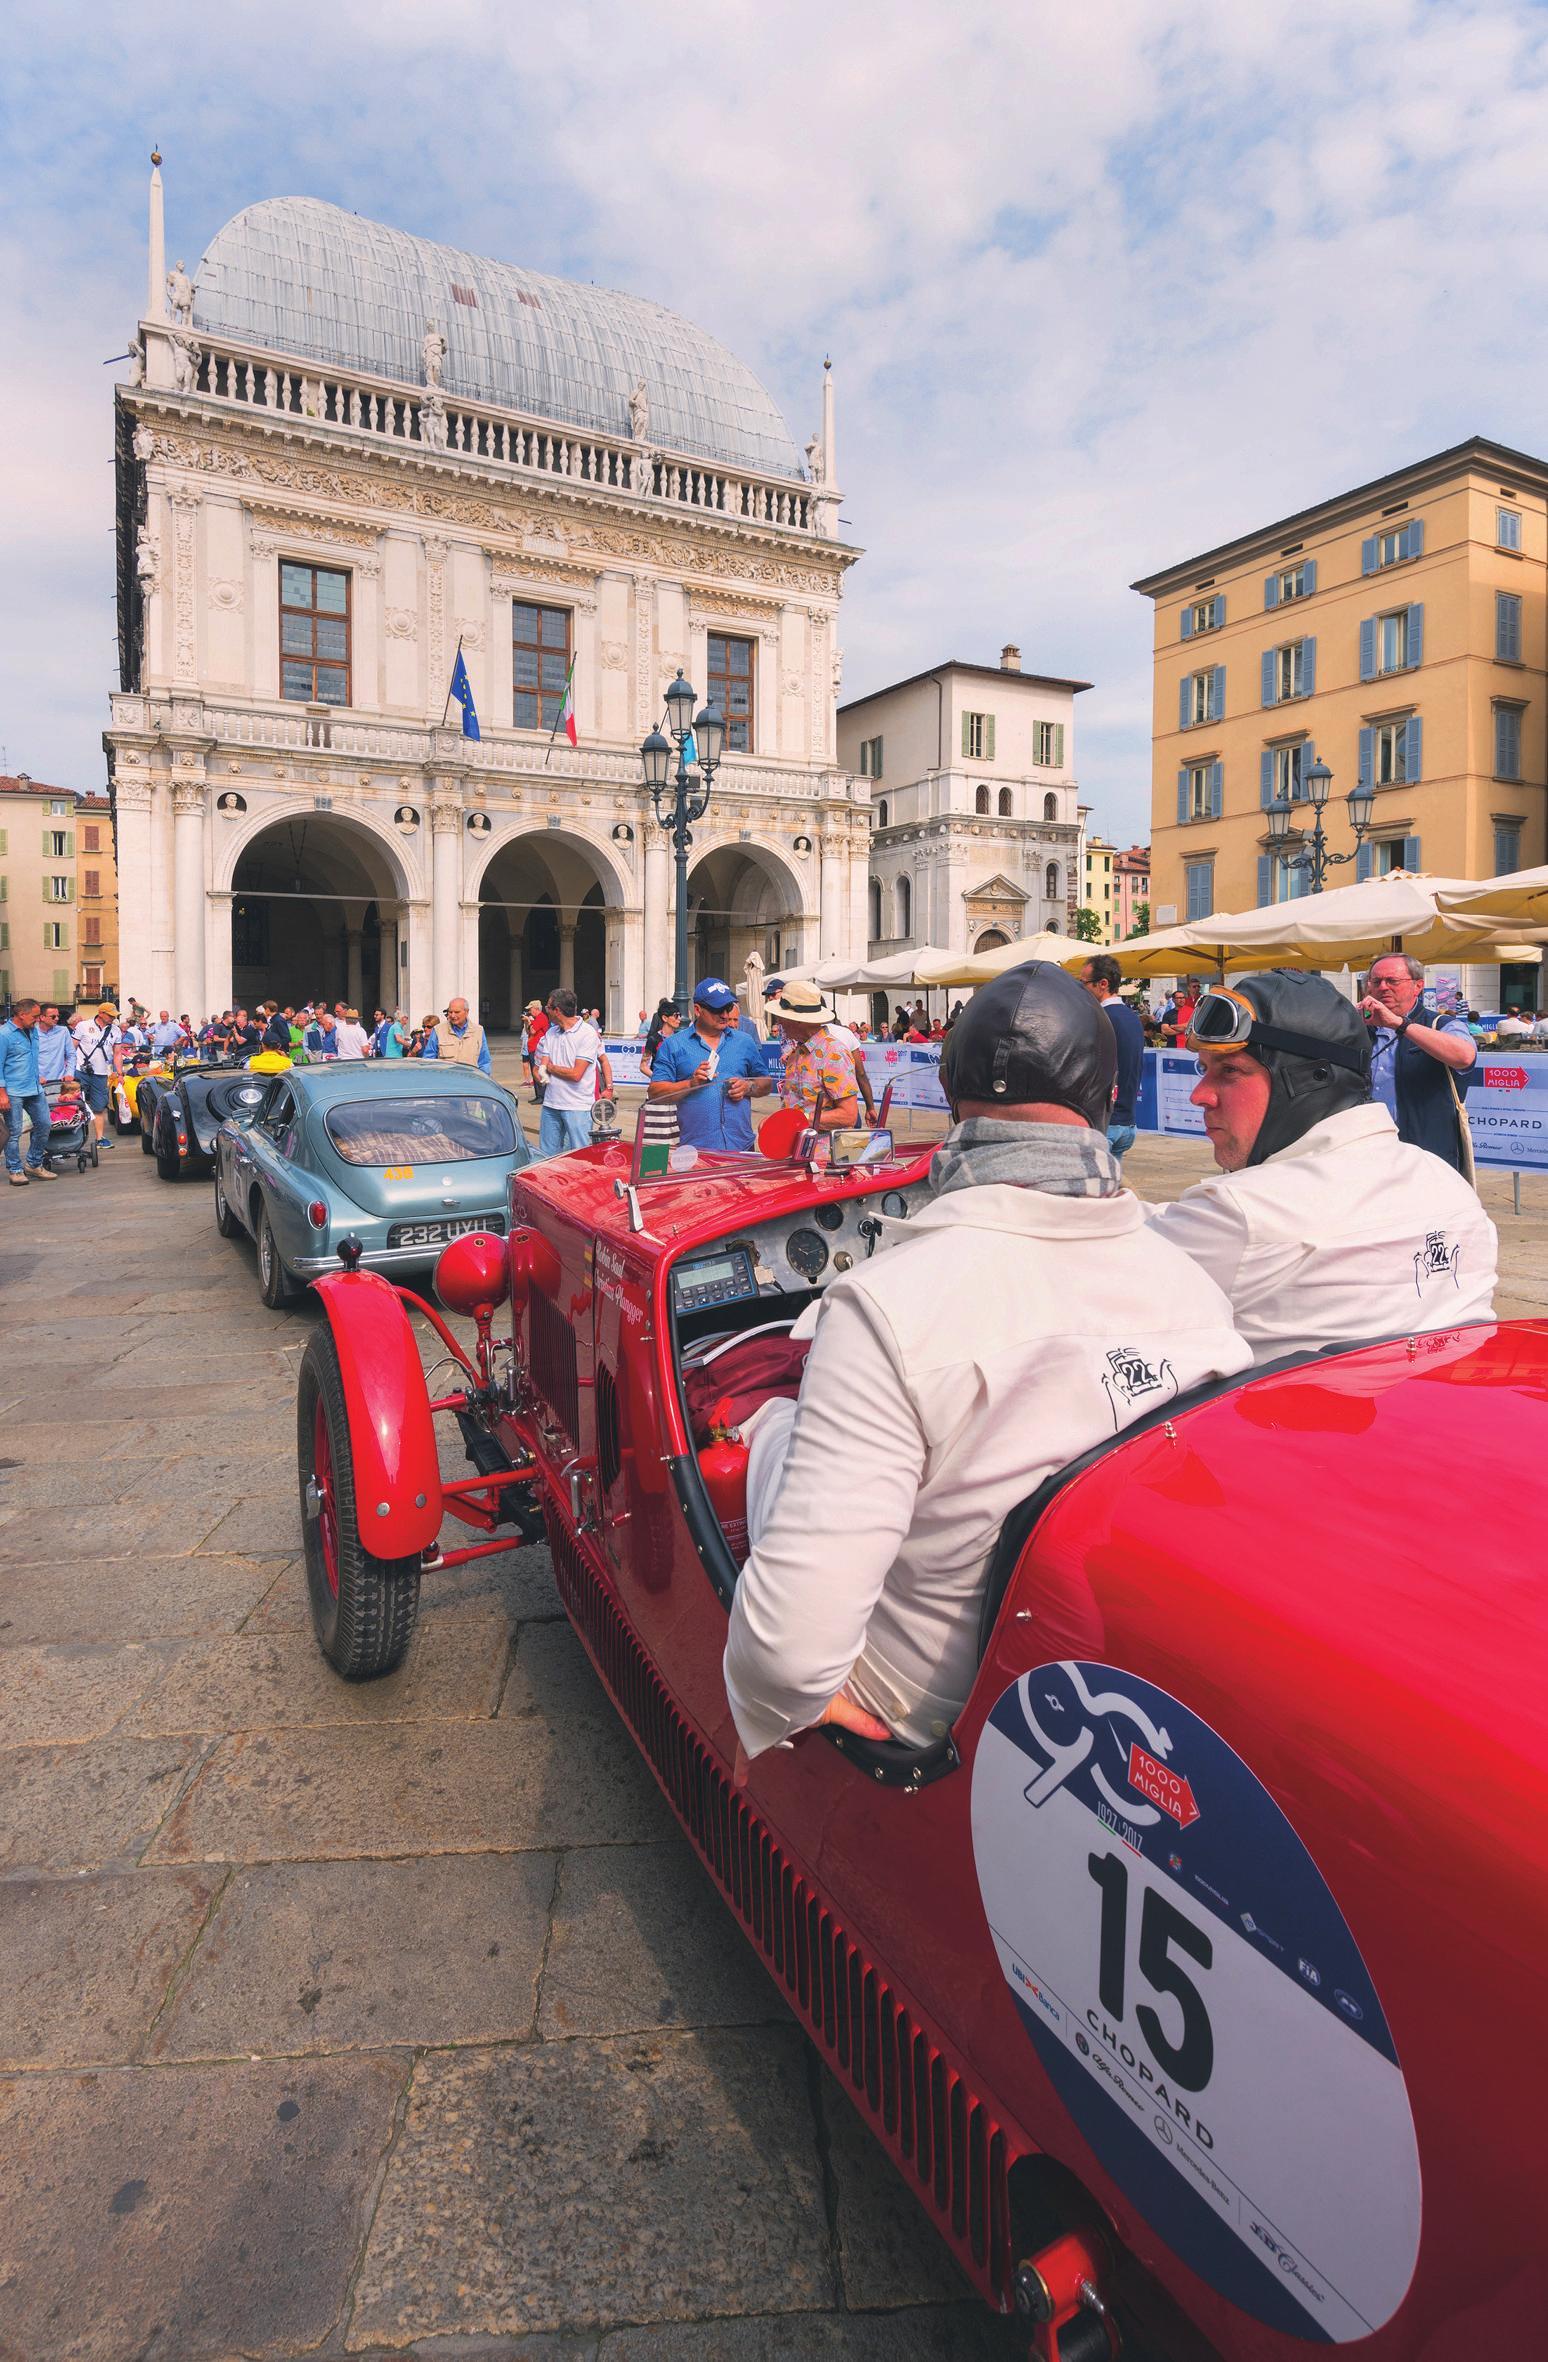 Italien, let's meet here! Image 2